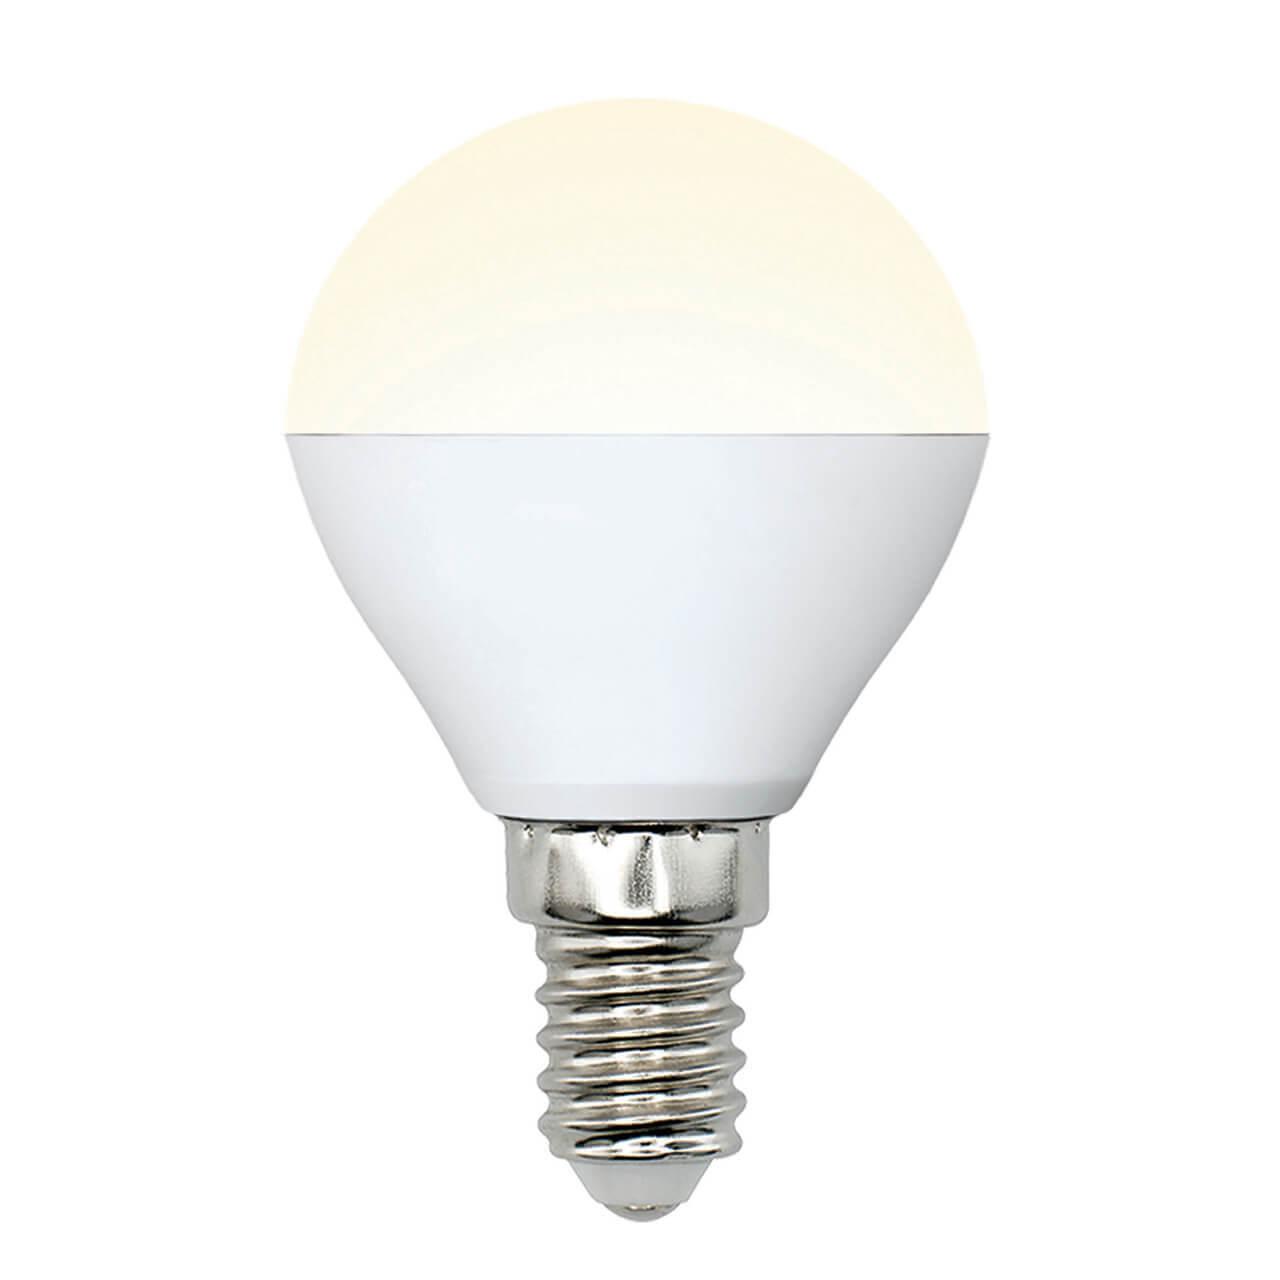 цена на Лампа светодиодная (UL-00002375) E14 6W 4000K матовая LED-G45-6W/WW/E14/FR/MB PLM11WH